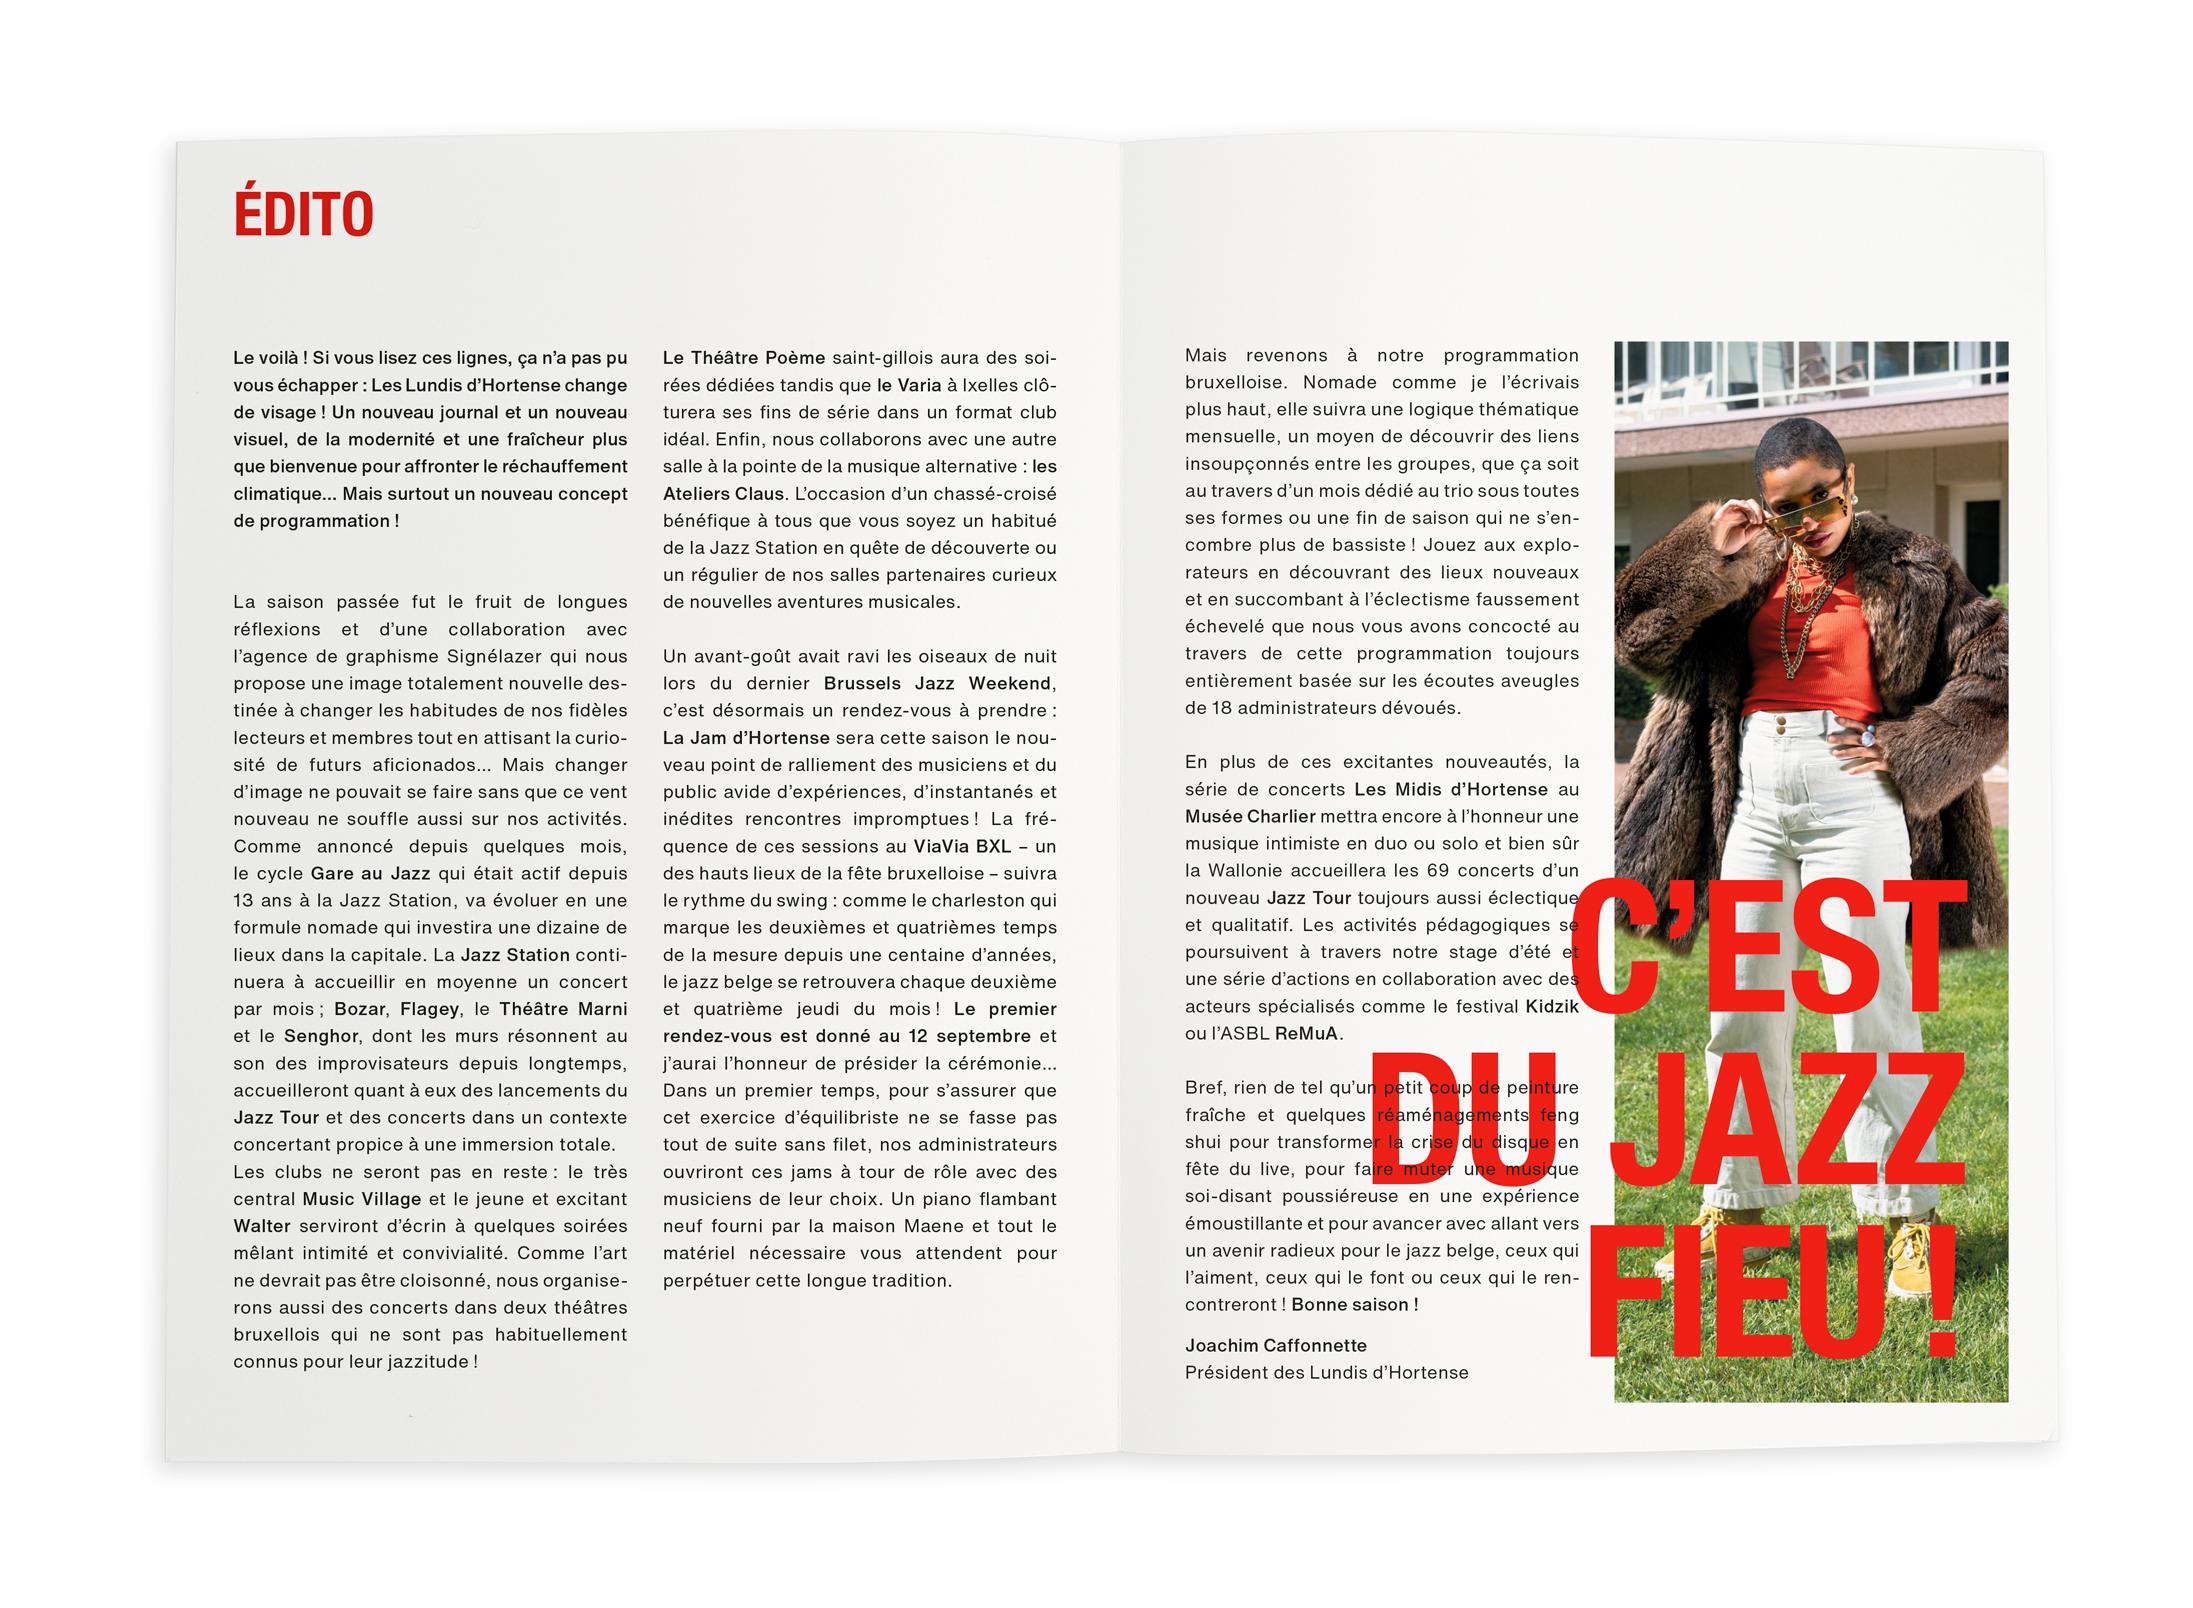 LDH JazzHortense 01